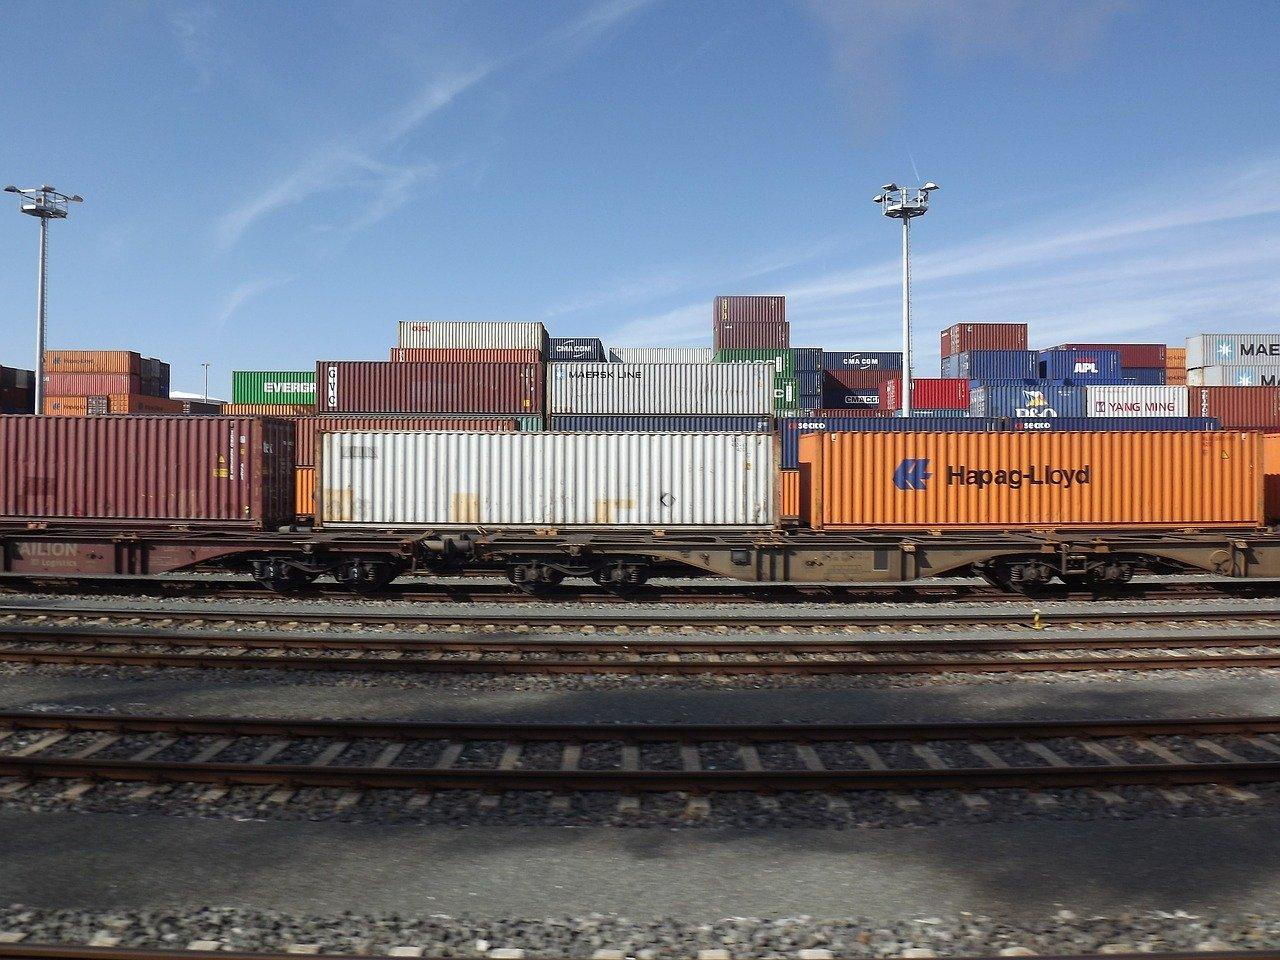 freight train, freight transport, transport of goods